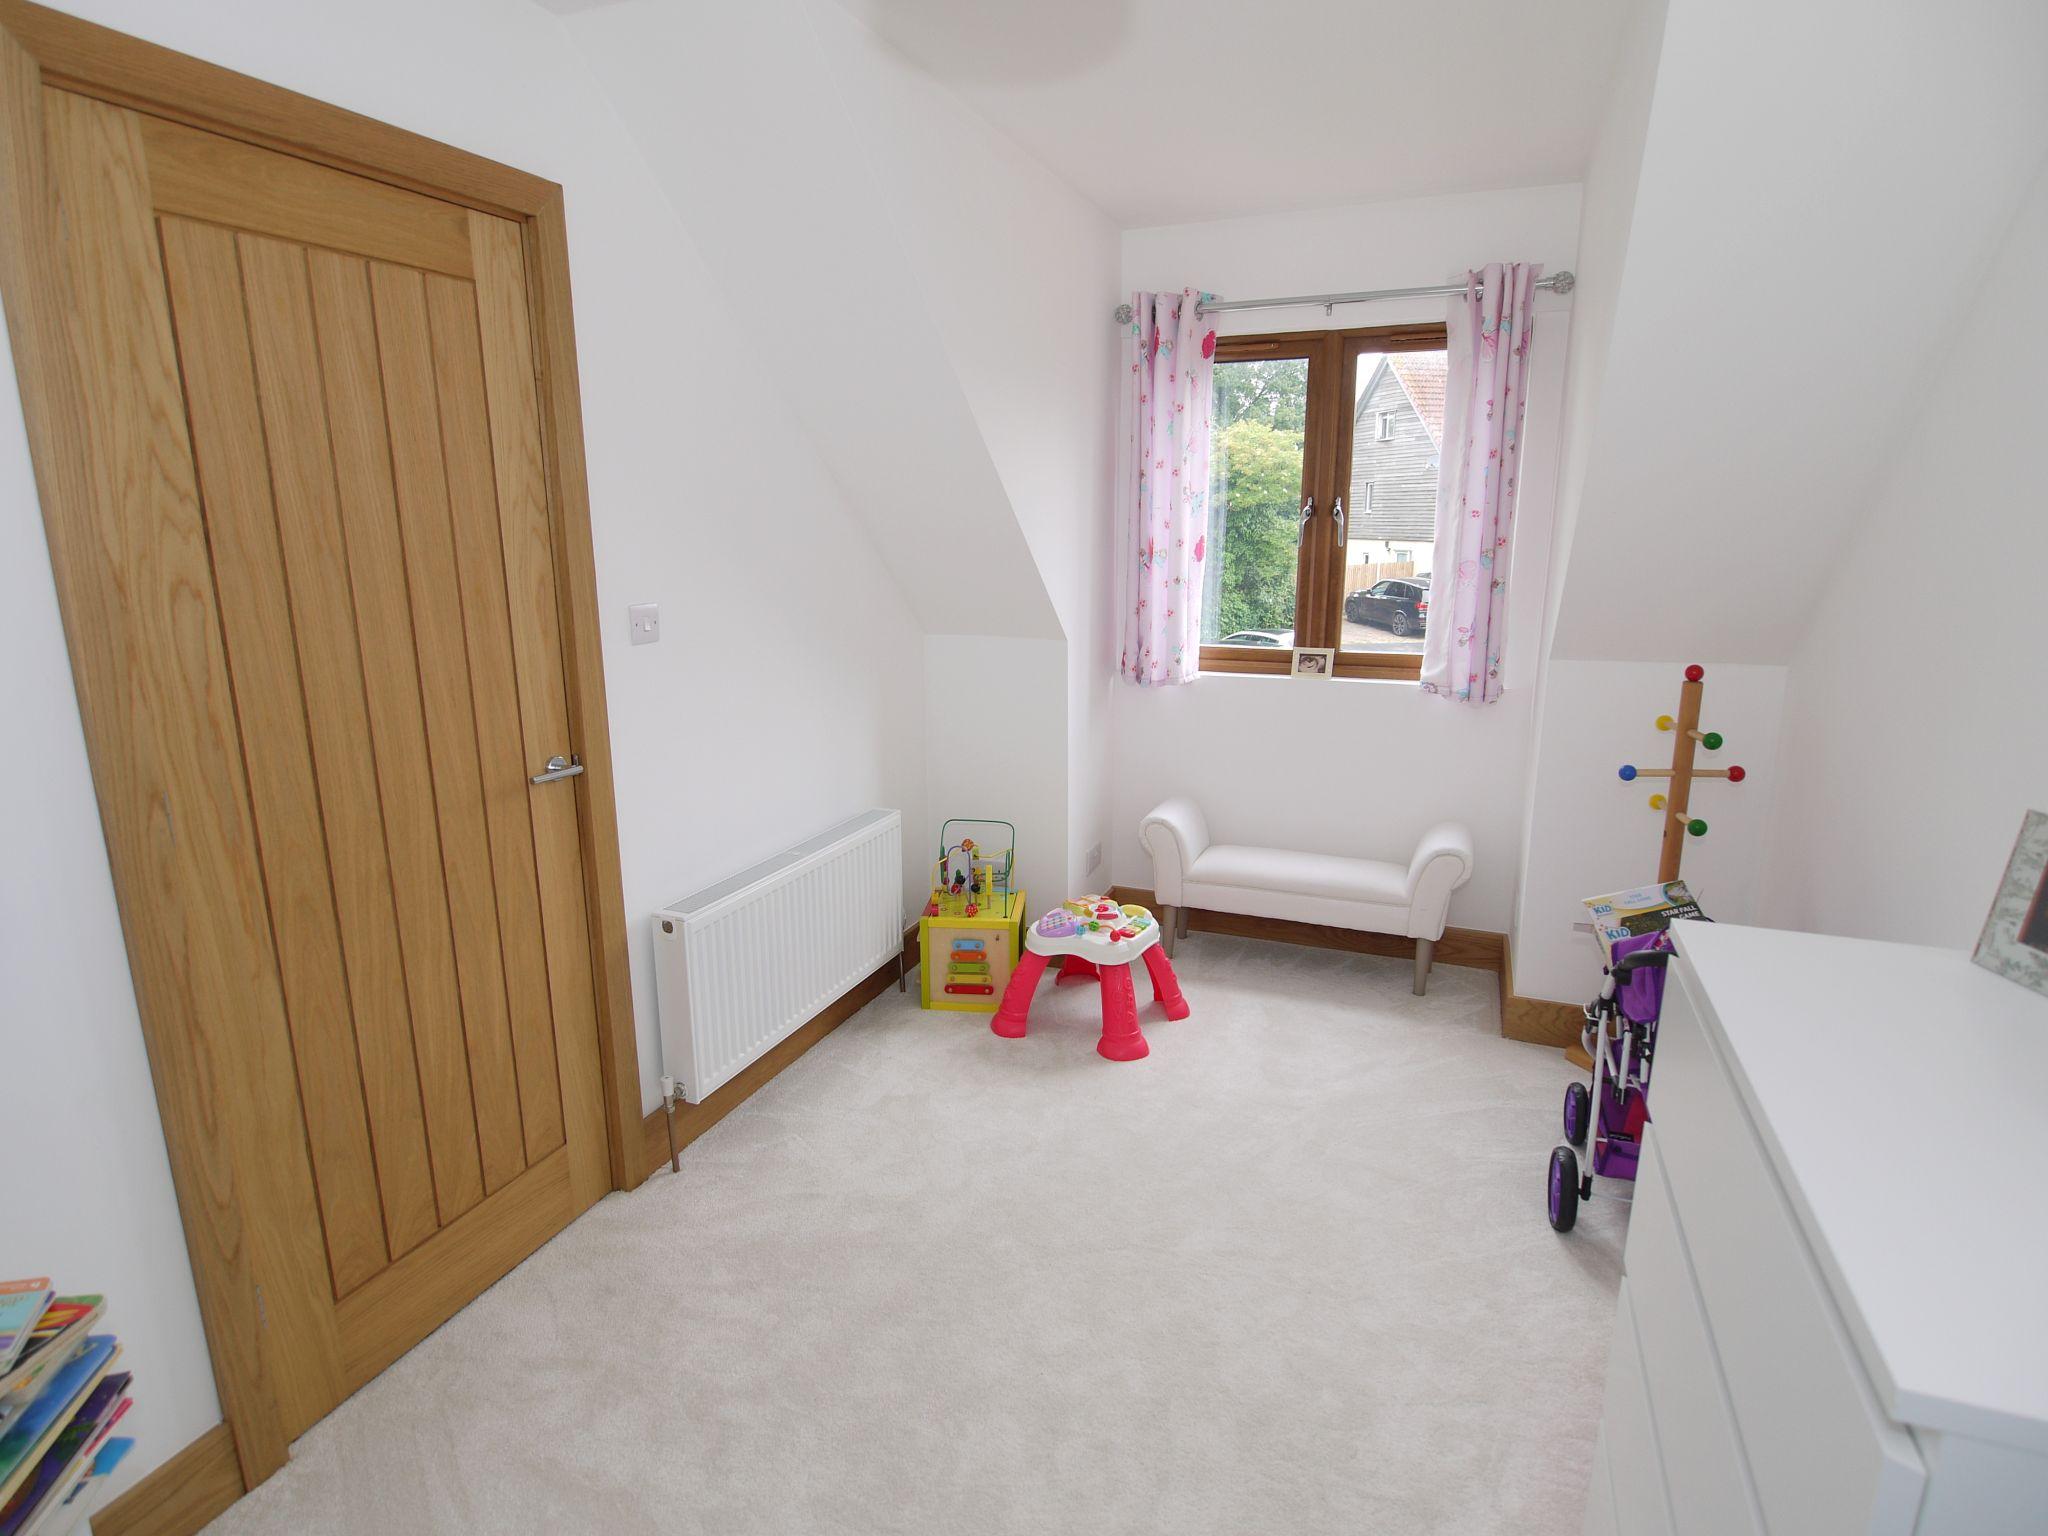 5 bedroom detached house Sold in Sevenoaks - Photograph 15